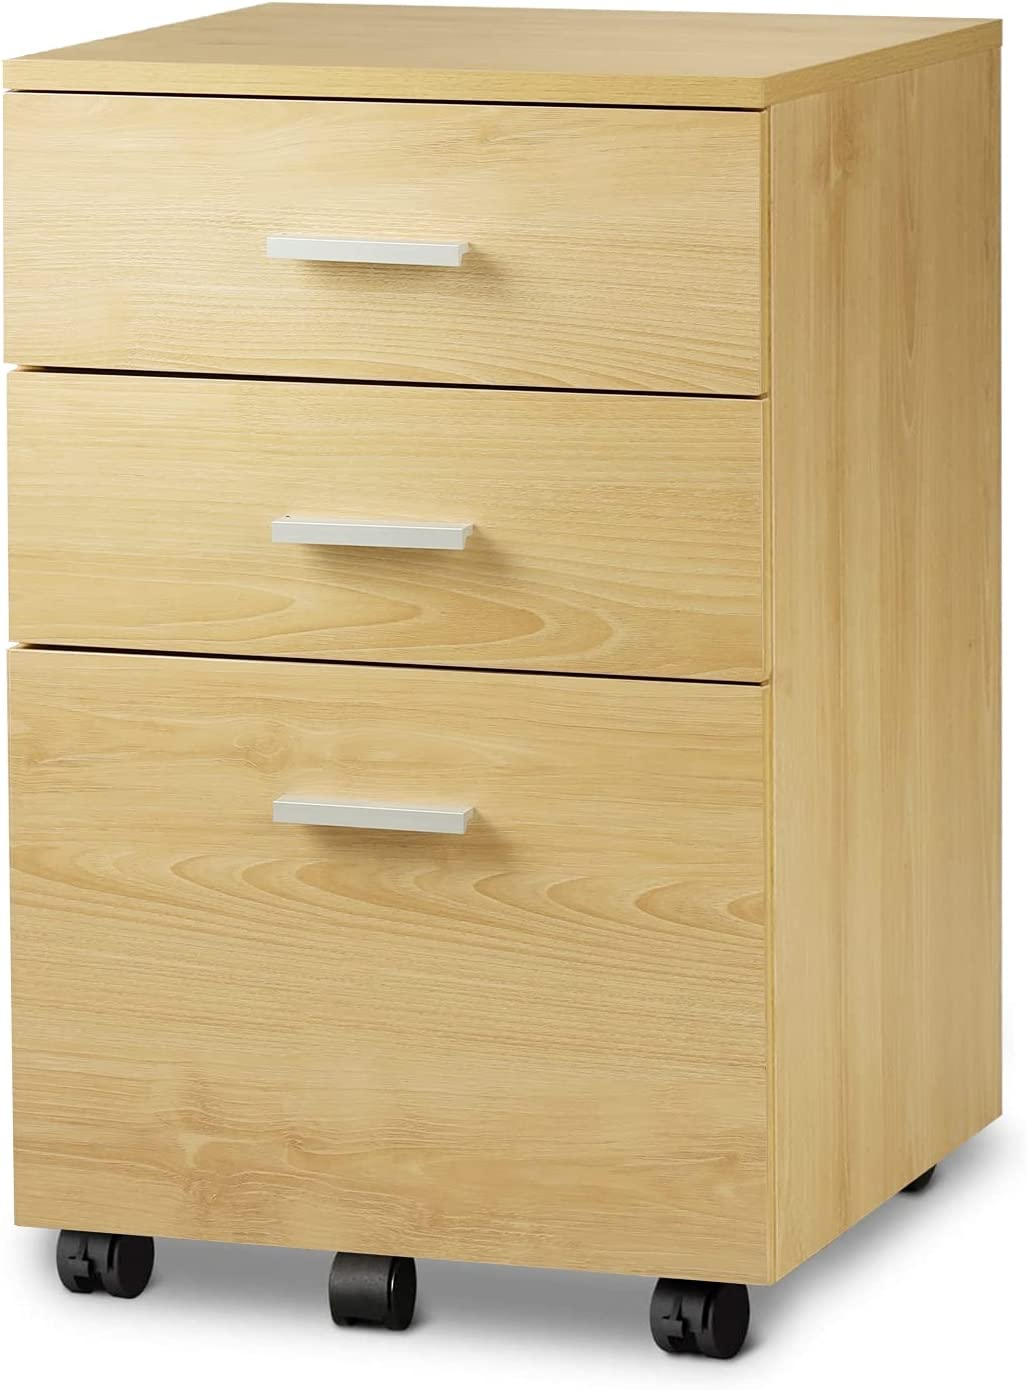 DEVAISE 3 Drawer Wood Mobile File Cabinet, Rolling Filing Cabinet for Letter/A4 Size, Oak